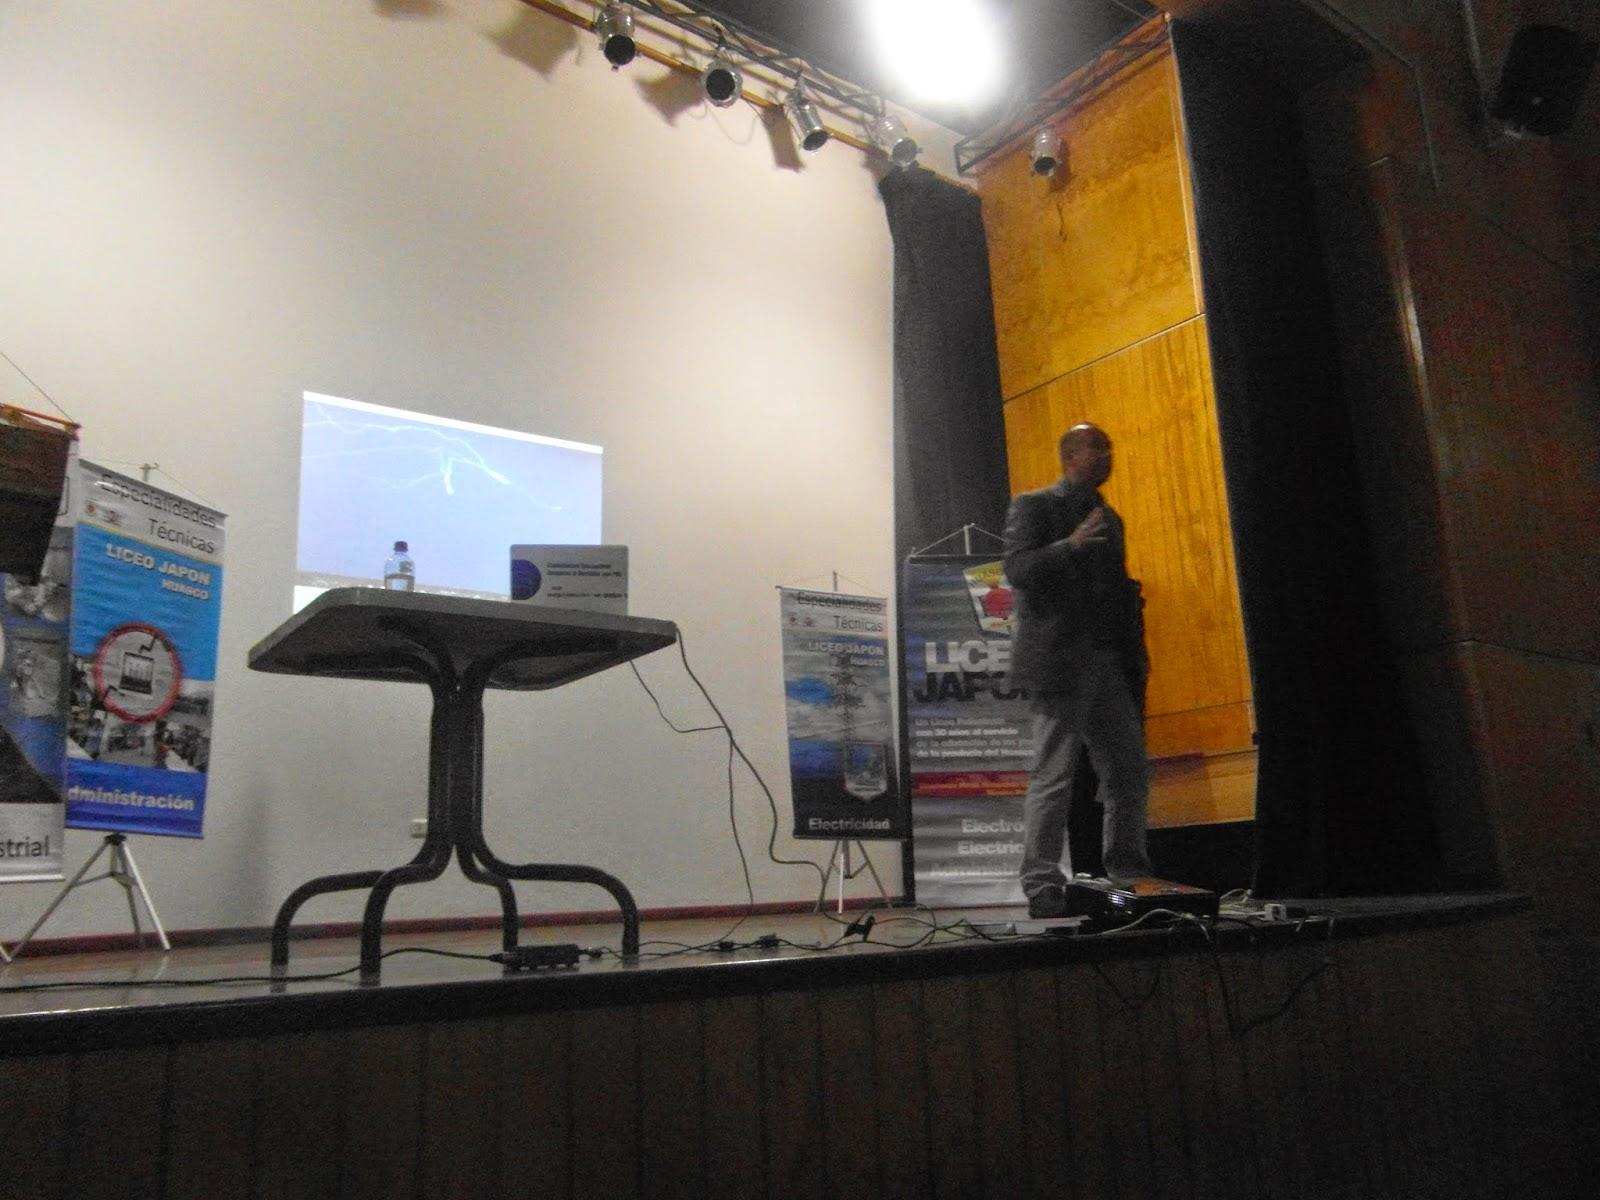 Liceo Japón Huasco Chile Charla Motivacional De Ivan Guerrero